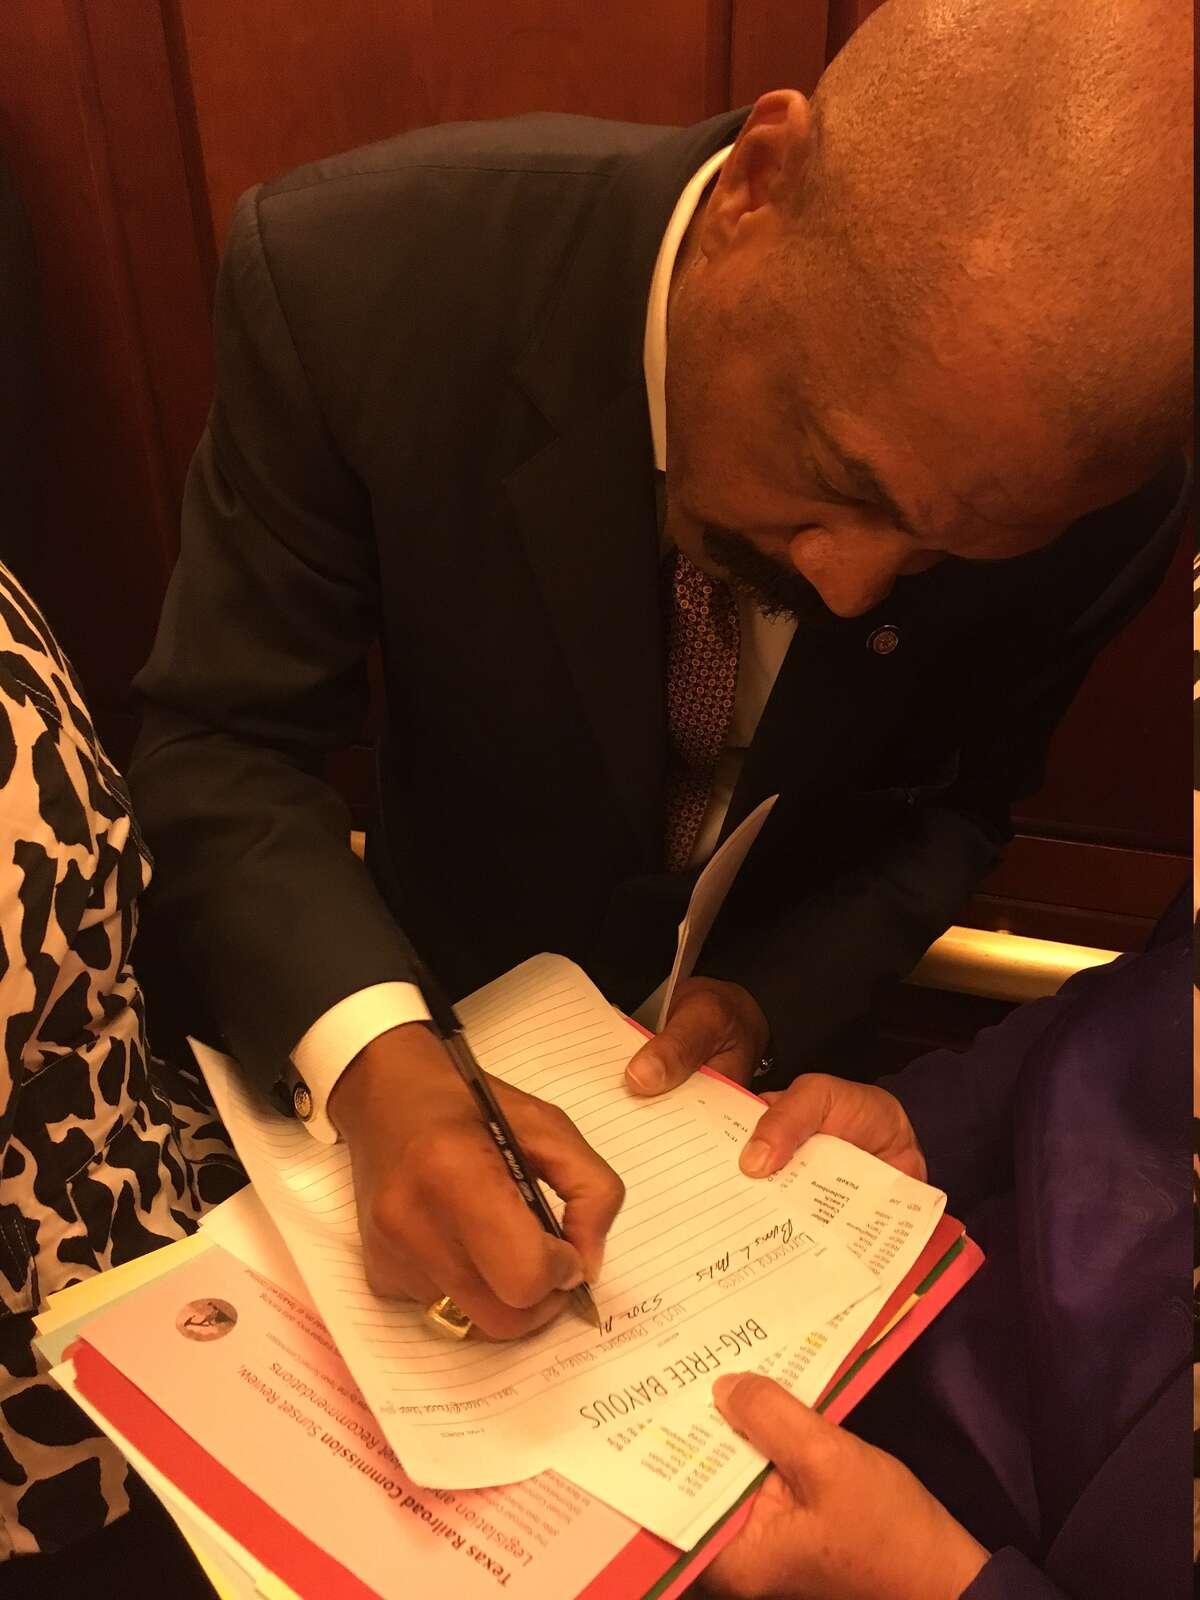 Texas state senator Borris Miles (D-Houston) signs the Bag Free Bayous petition.